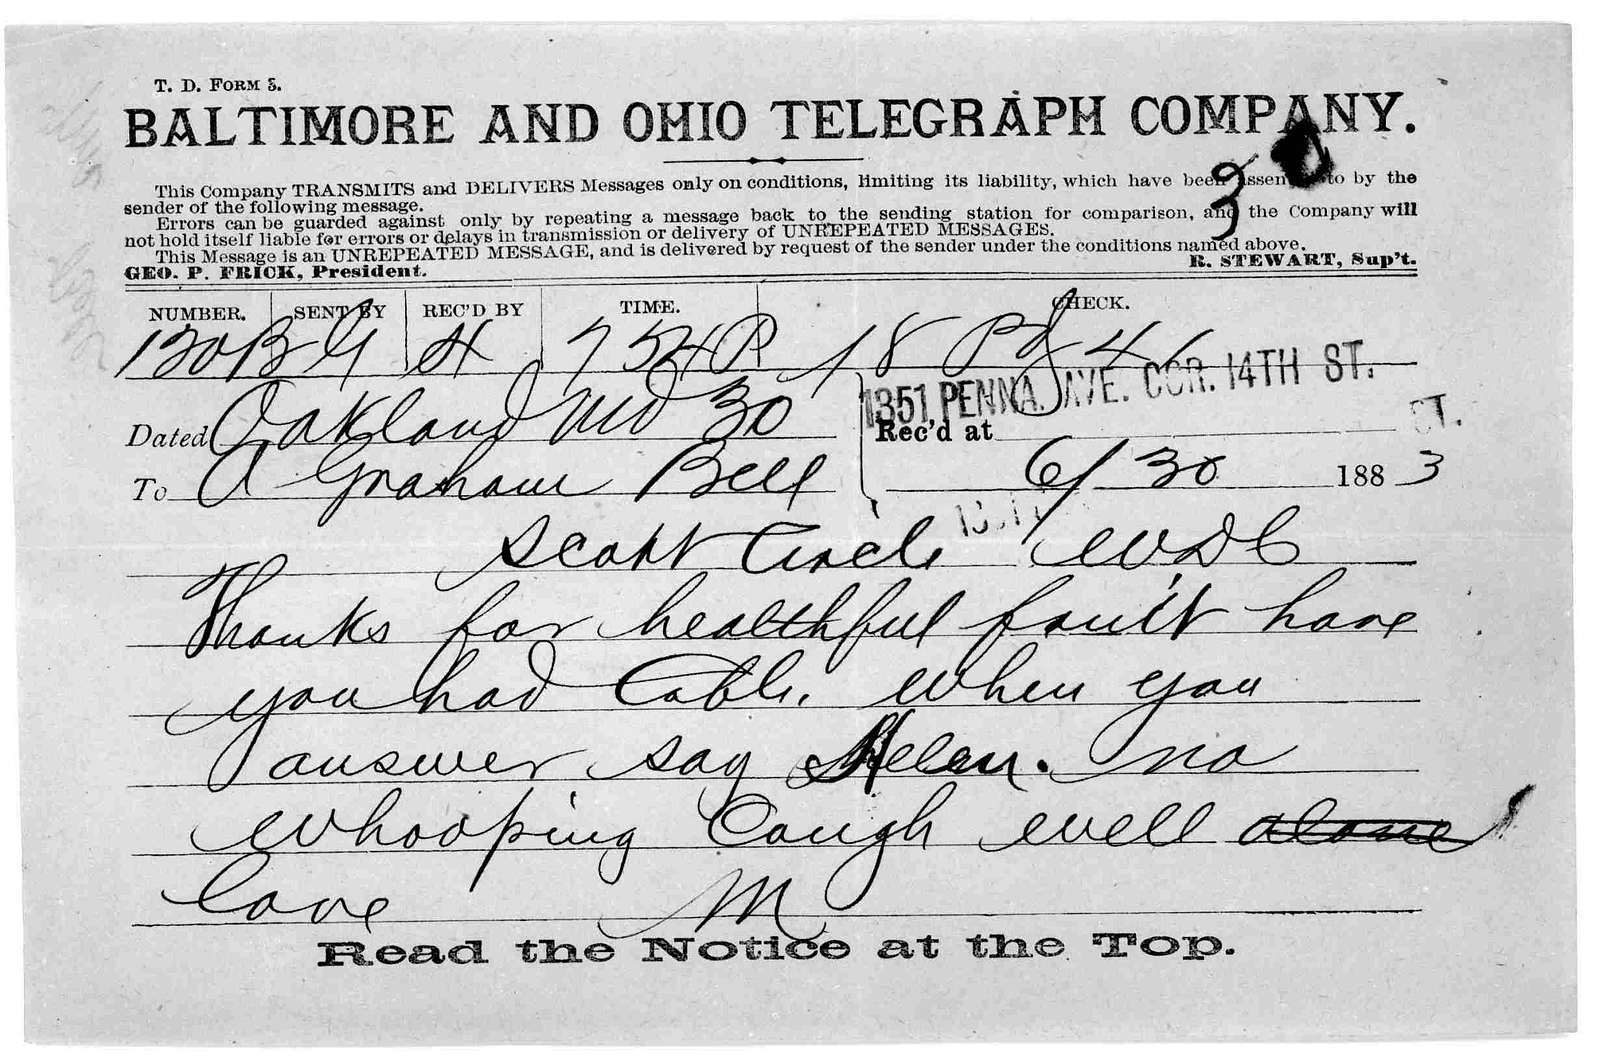 Telegram from Mabel Hubbard Bell to Alexander Graham Bell, June 30, 1883